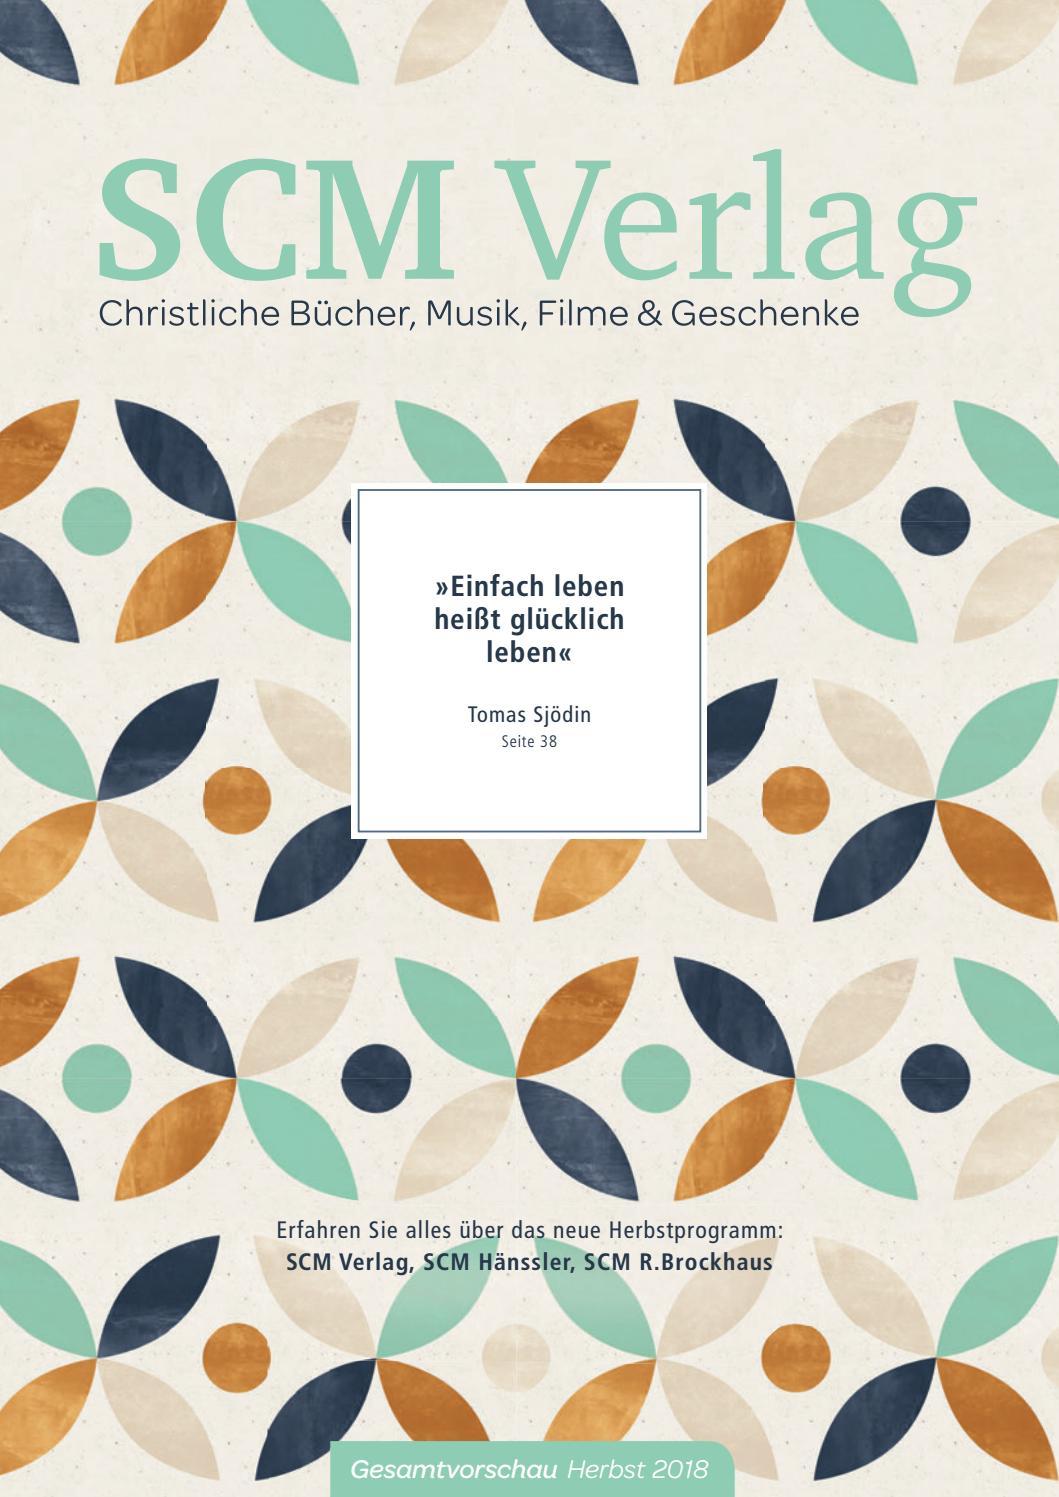 SCM Verlag Gesamtvorschau Herbst 2018 by SCM Verlagsgruppe - issuu